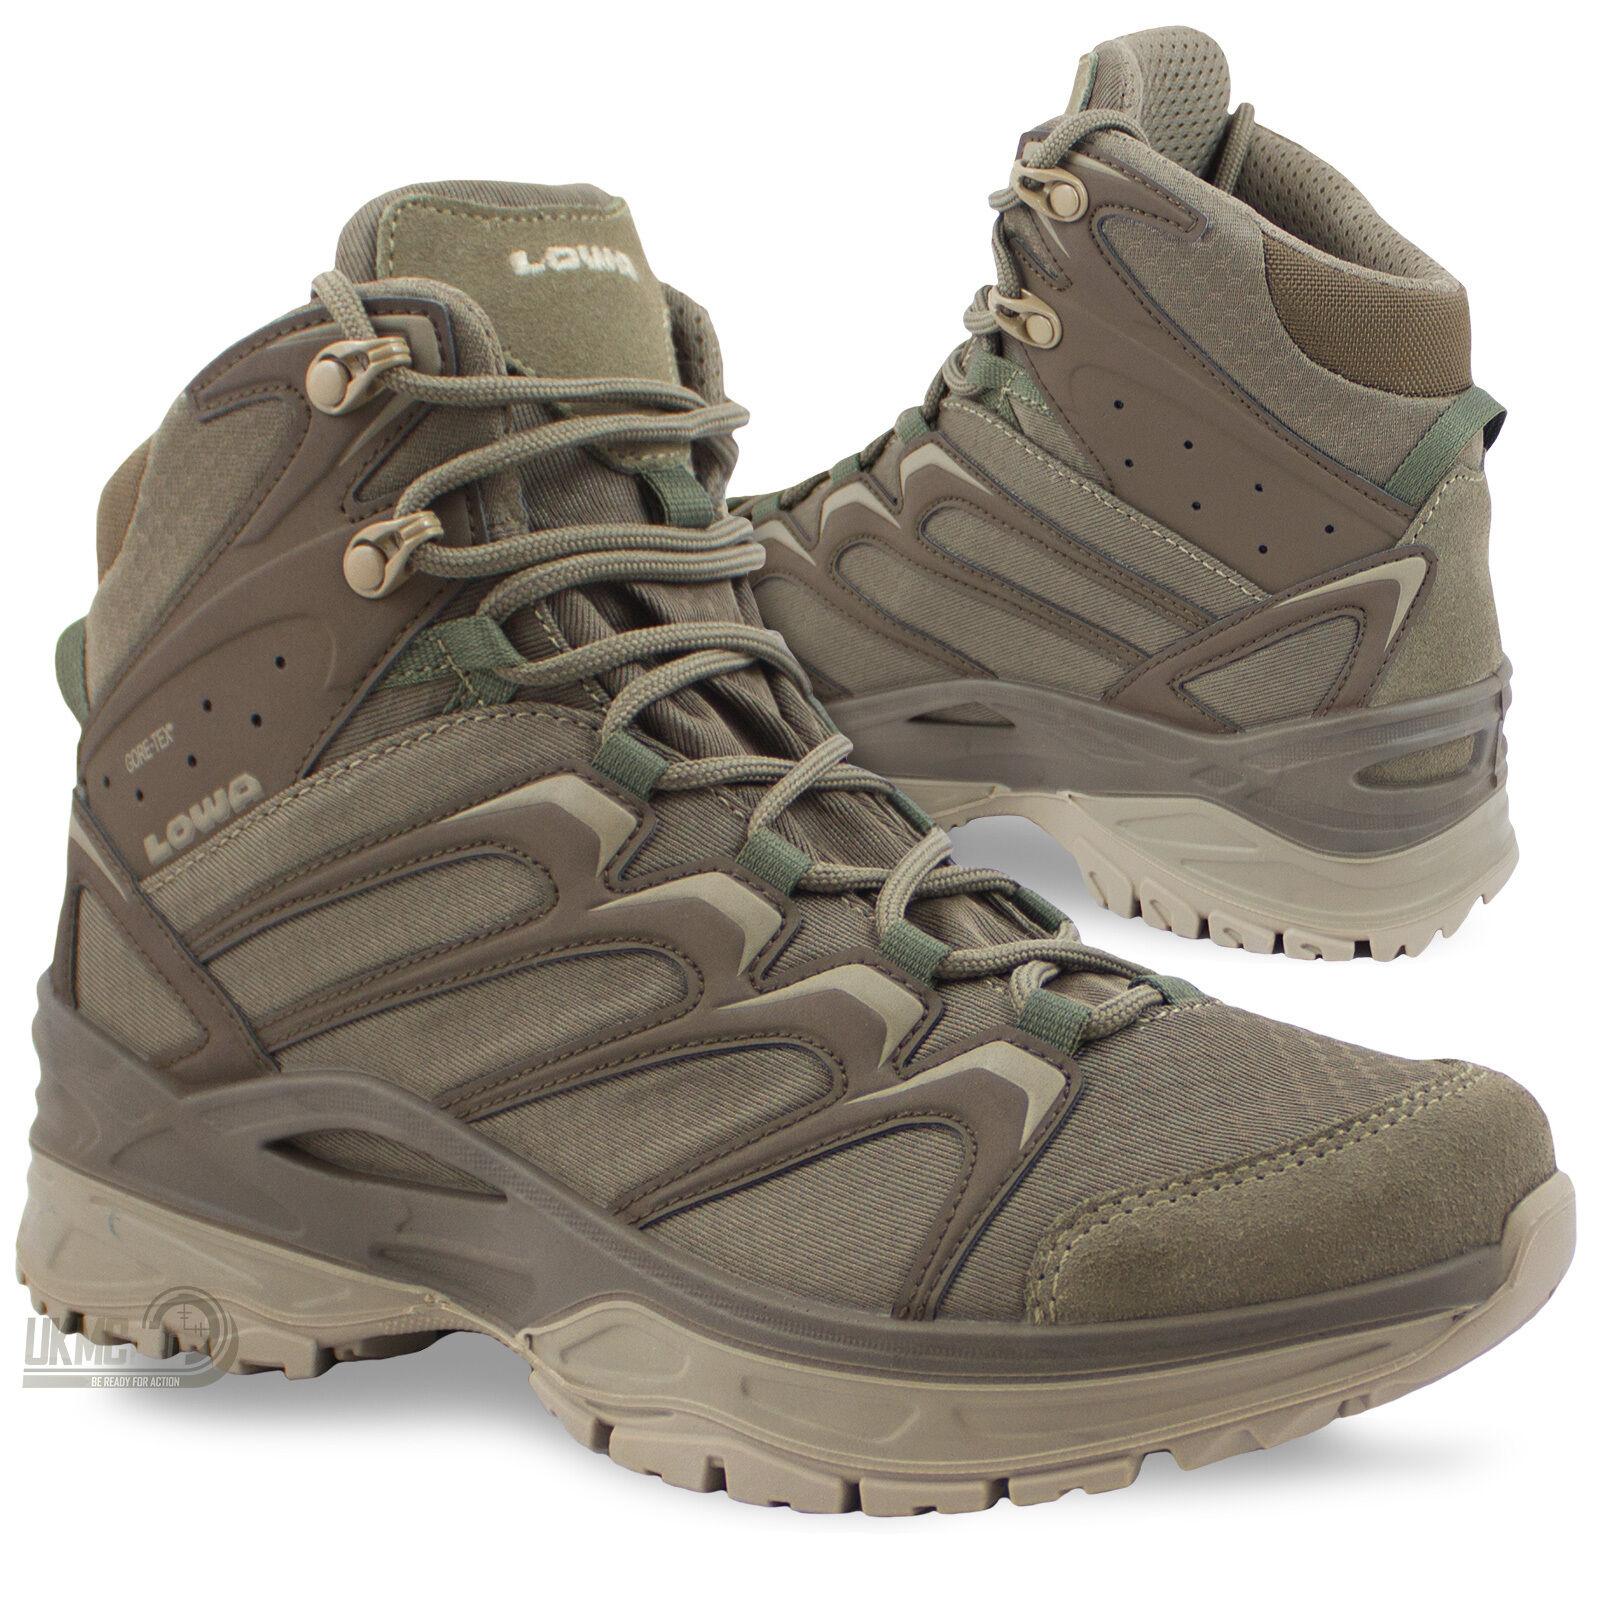 best website 3382b 837d7 Yükle (998x1000)Облегченные тактические ботинки LOWA Innox GTX MID  TFОблегченные тактические ботинки LOWA Innox GTX MID TF.